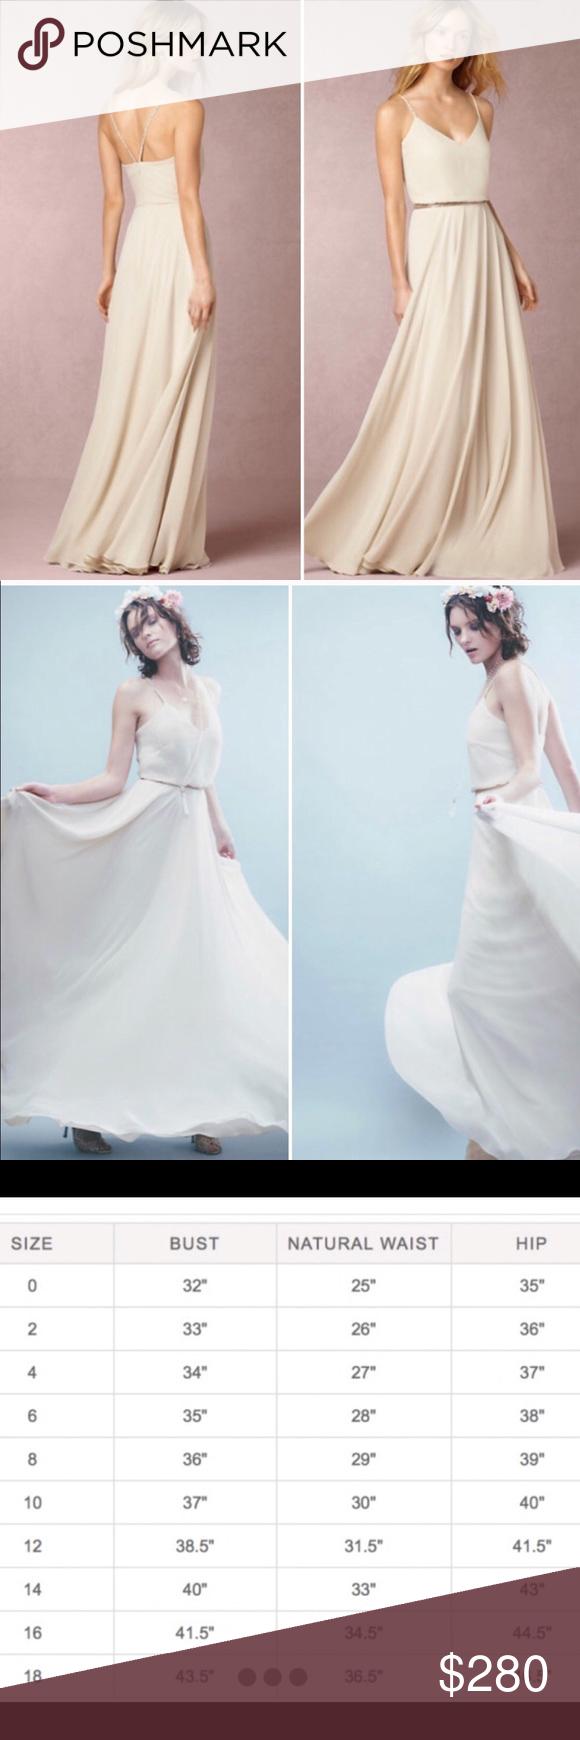 d8f722d1c7d NWOT BHLDN Jenny Yoo Nadya Inesse dress